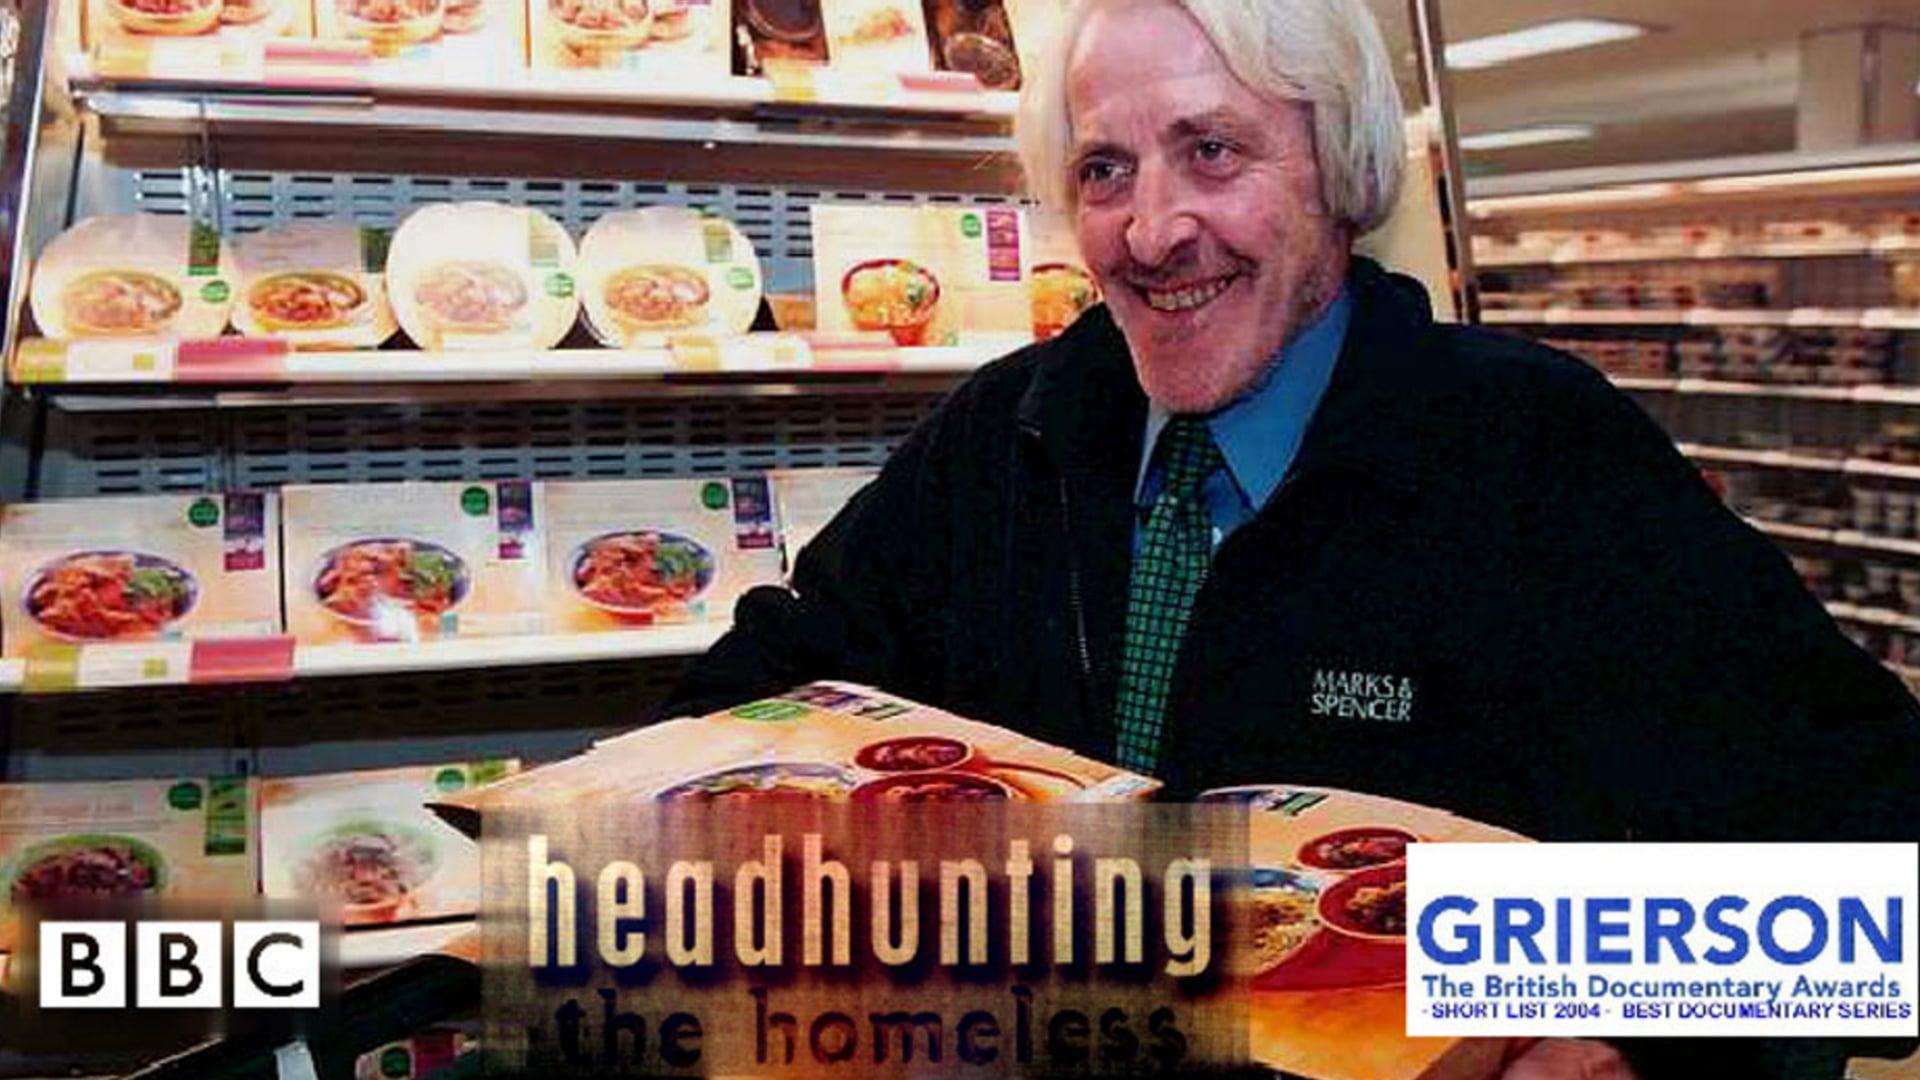 Headhunting the Homeless [BBC]